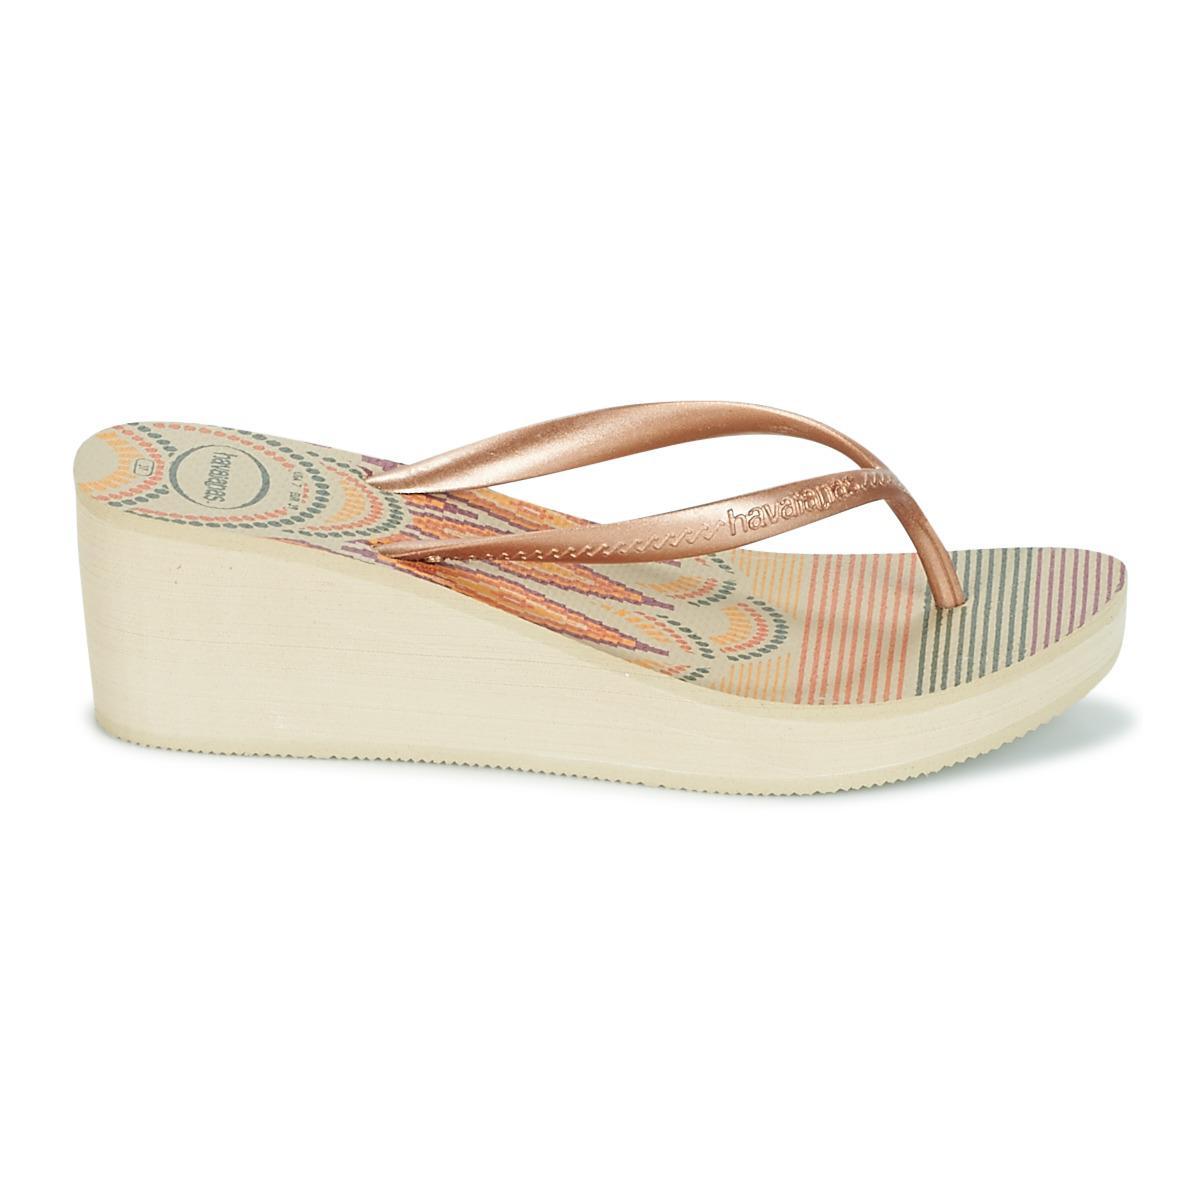 53b2b5ae129f58 Havaianas High Fashion Print Women s Flip Flops   Sandals (shoes) In ...